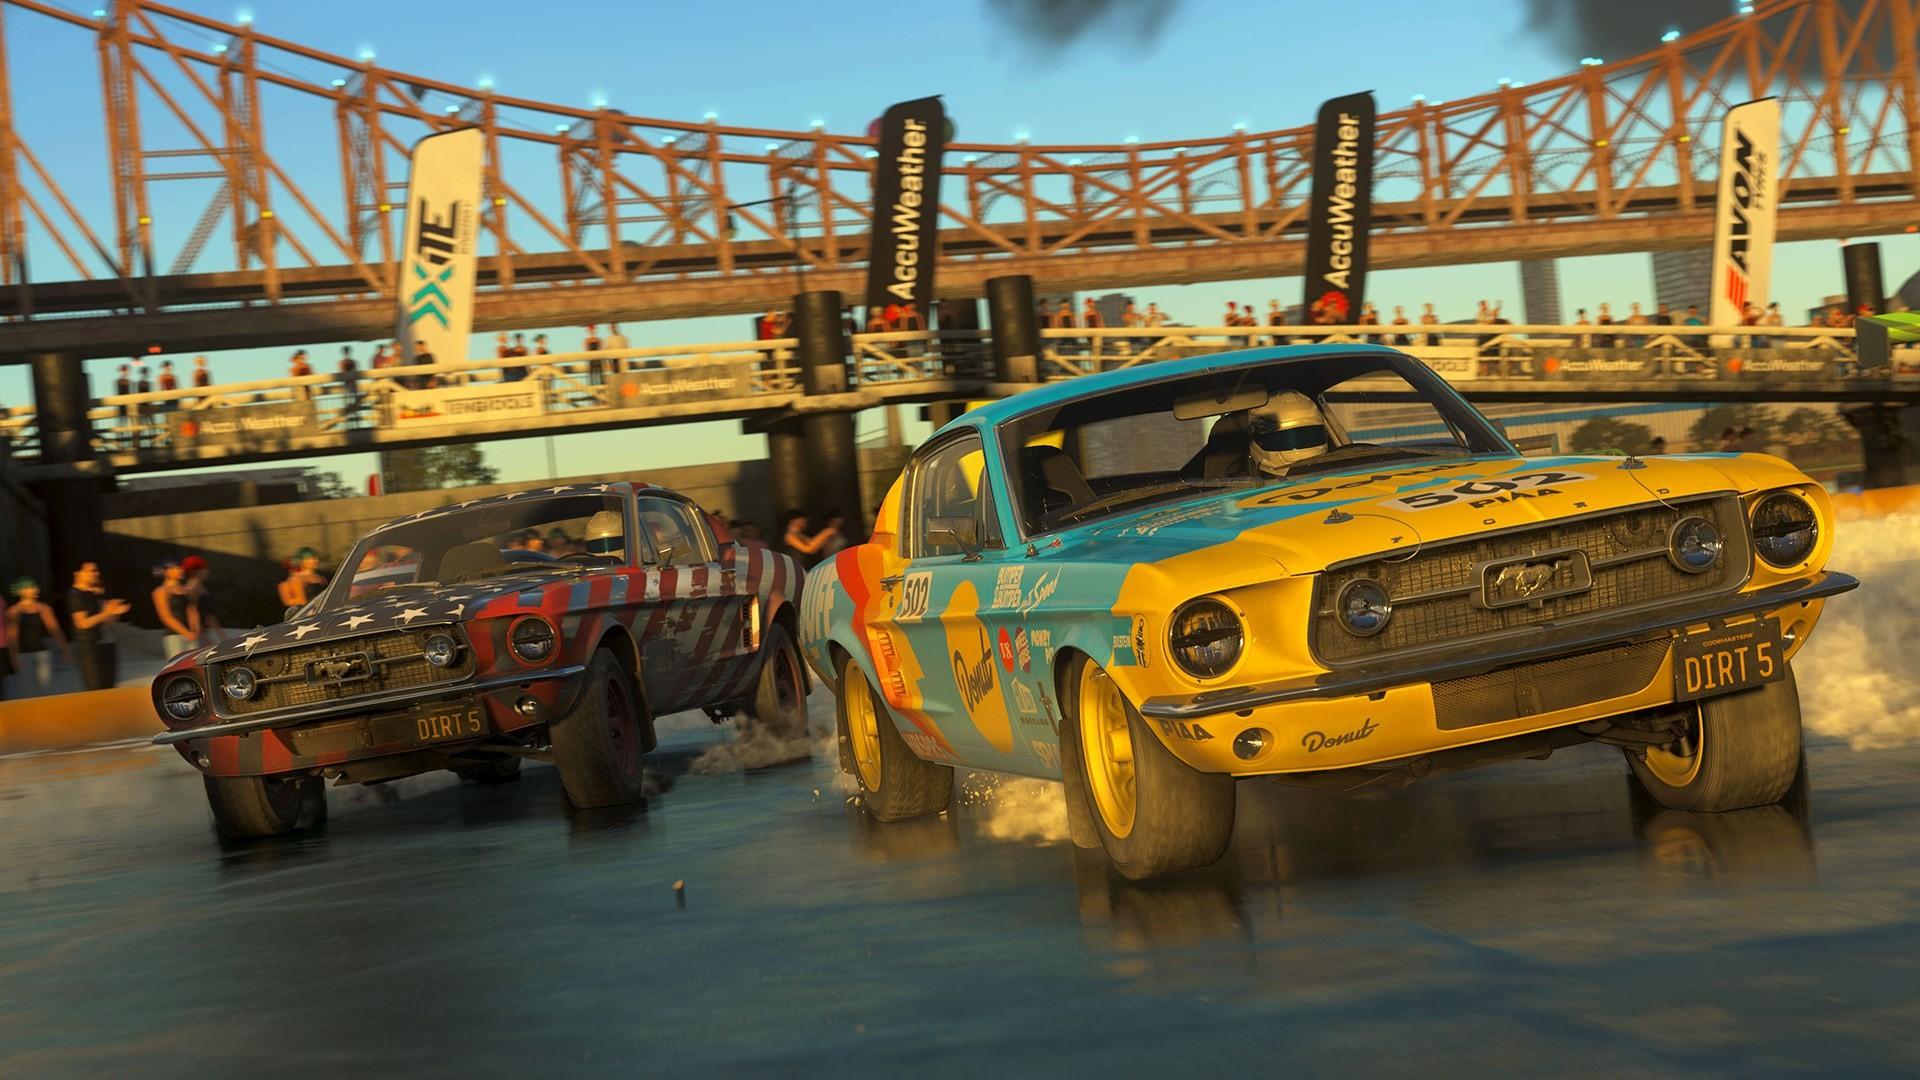 Dirt 5 (Optimized for Xbox Series X|S) – November 3